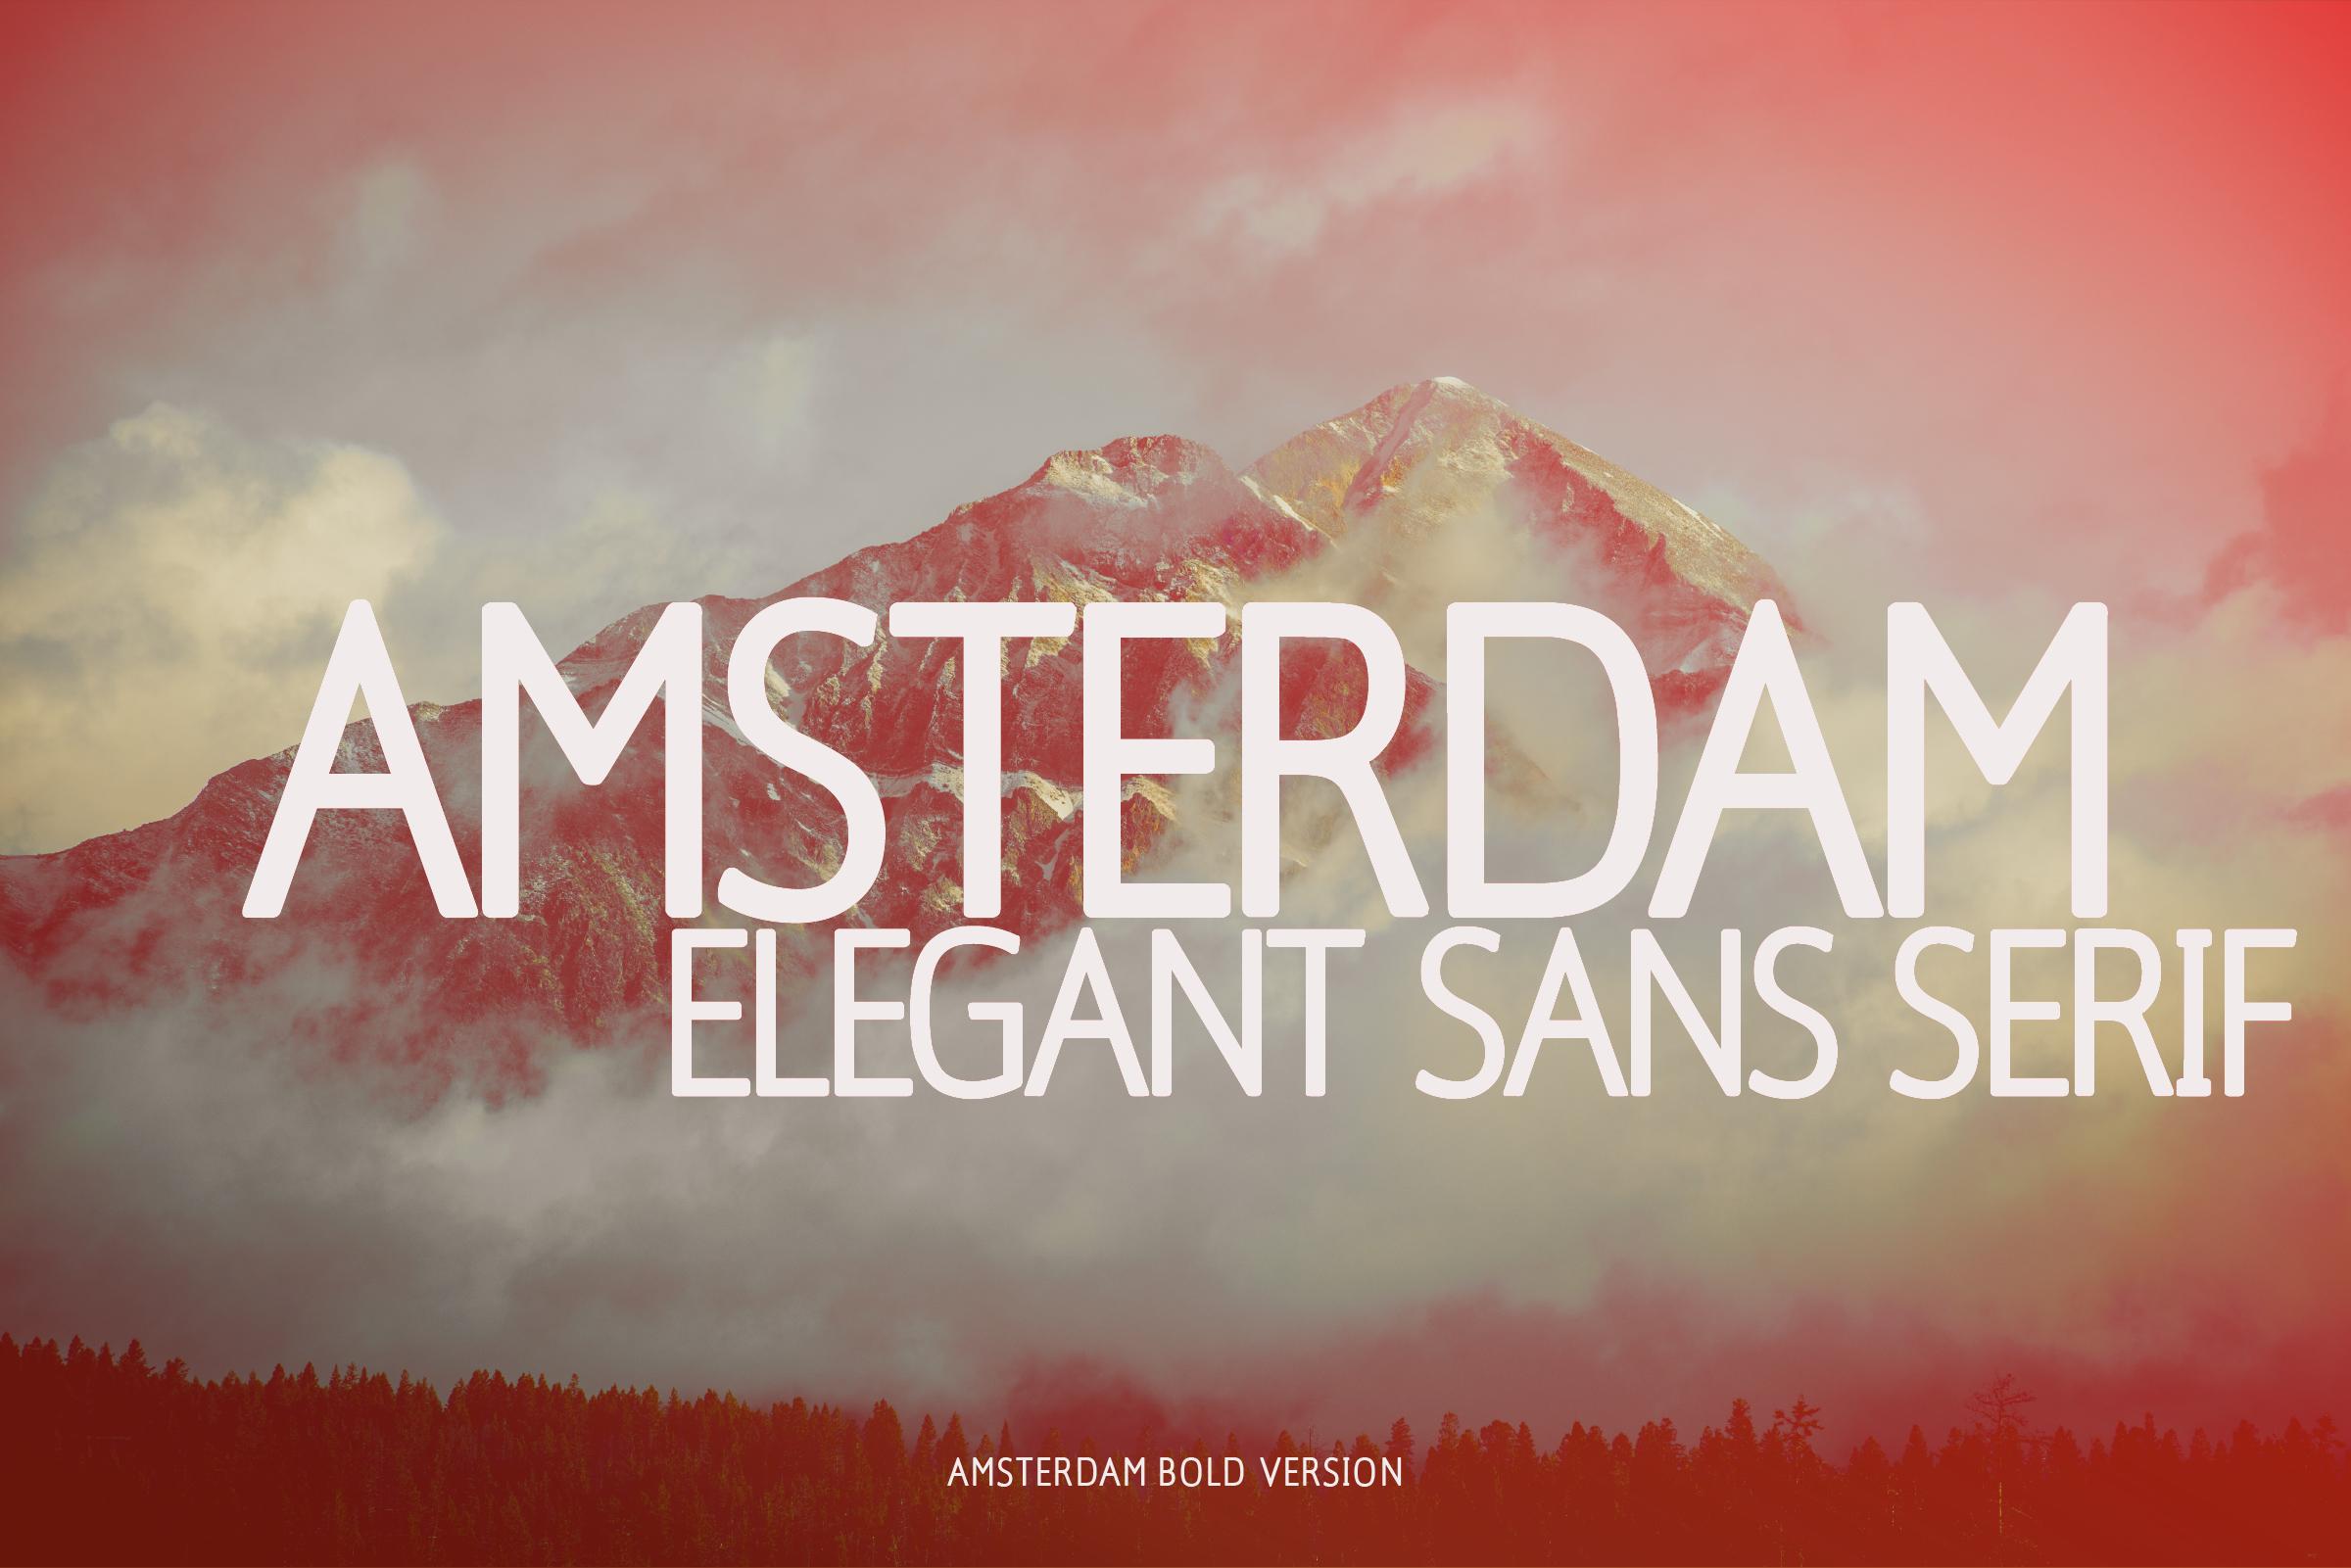 Amsterdam Bold Versionl Elegant font sans serif example image 2